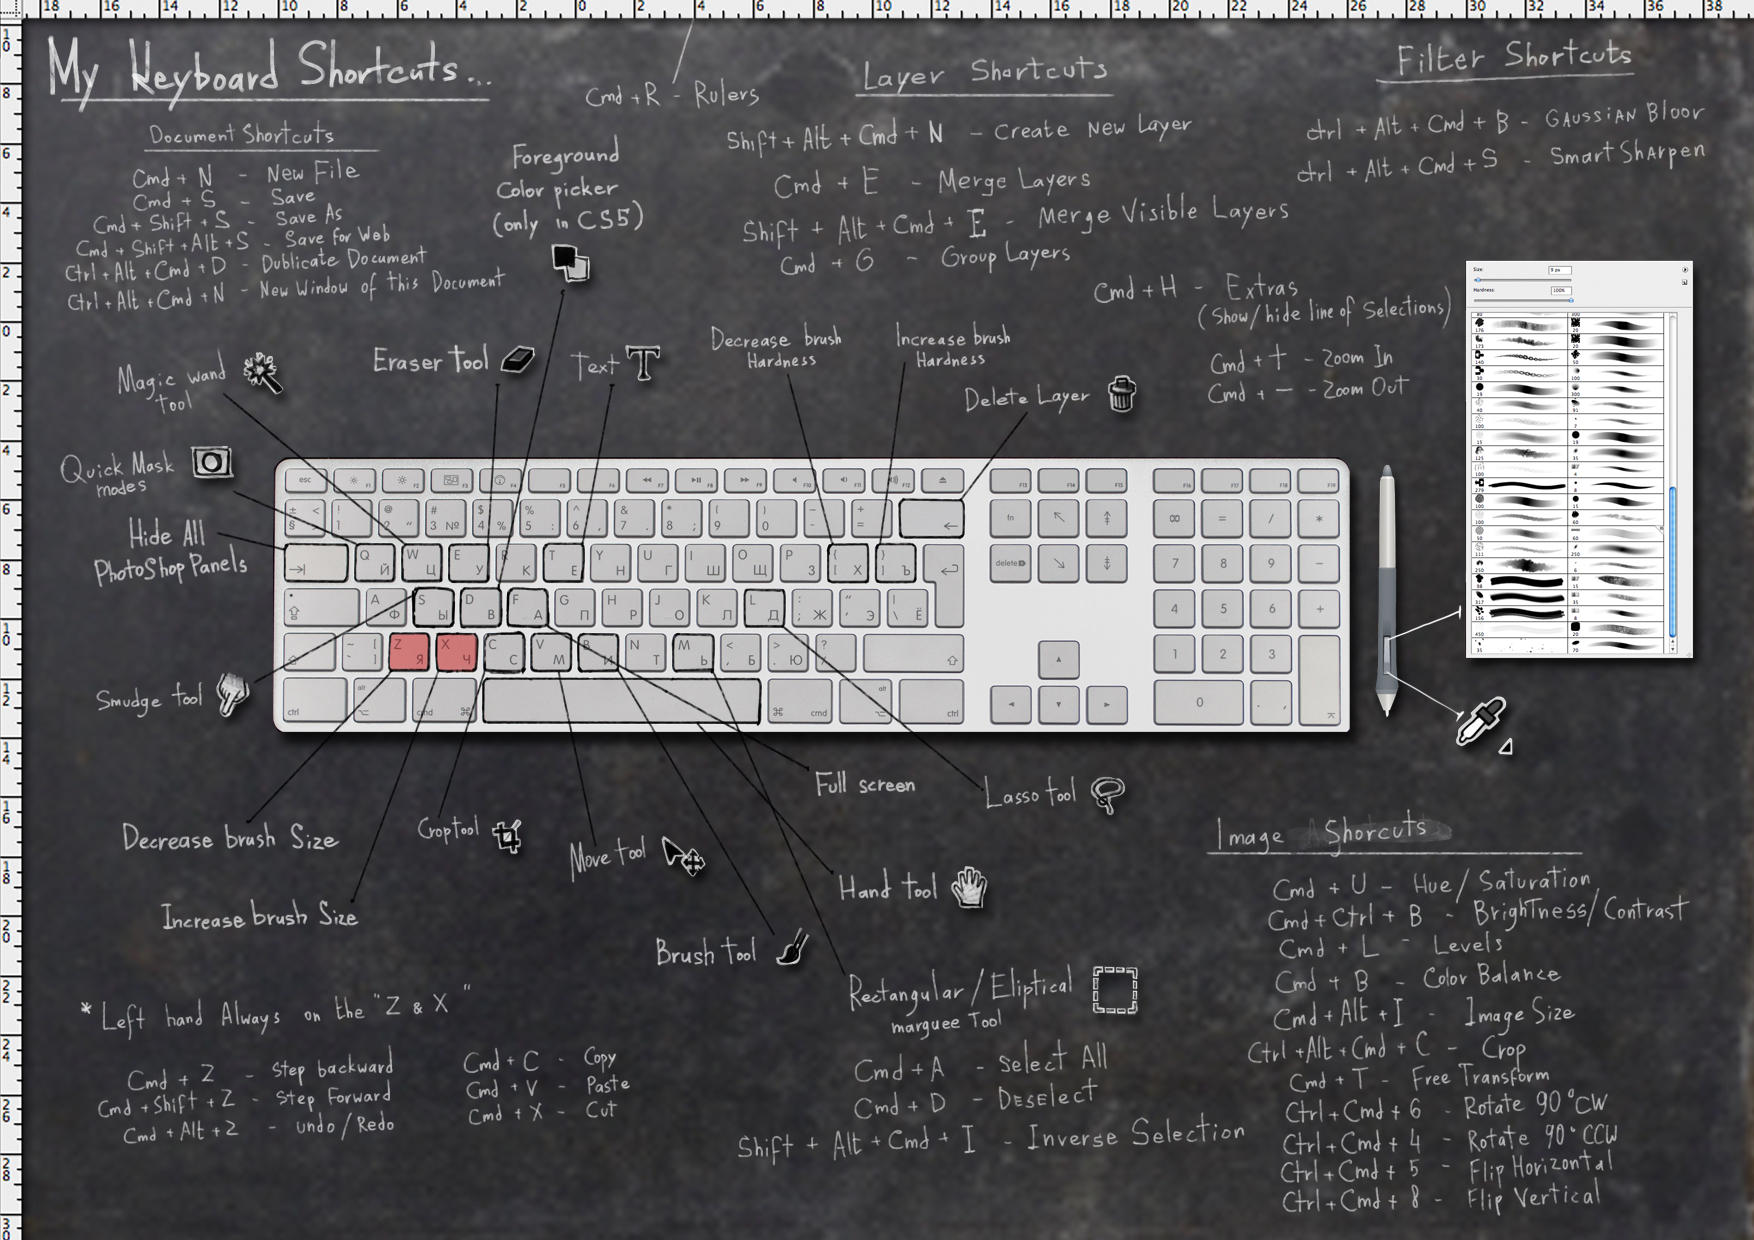 windows keyboard shortcuts wallpaper - photo #17